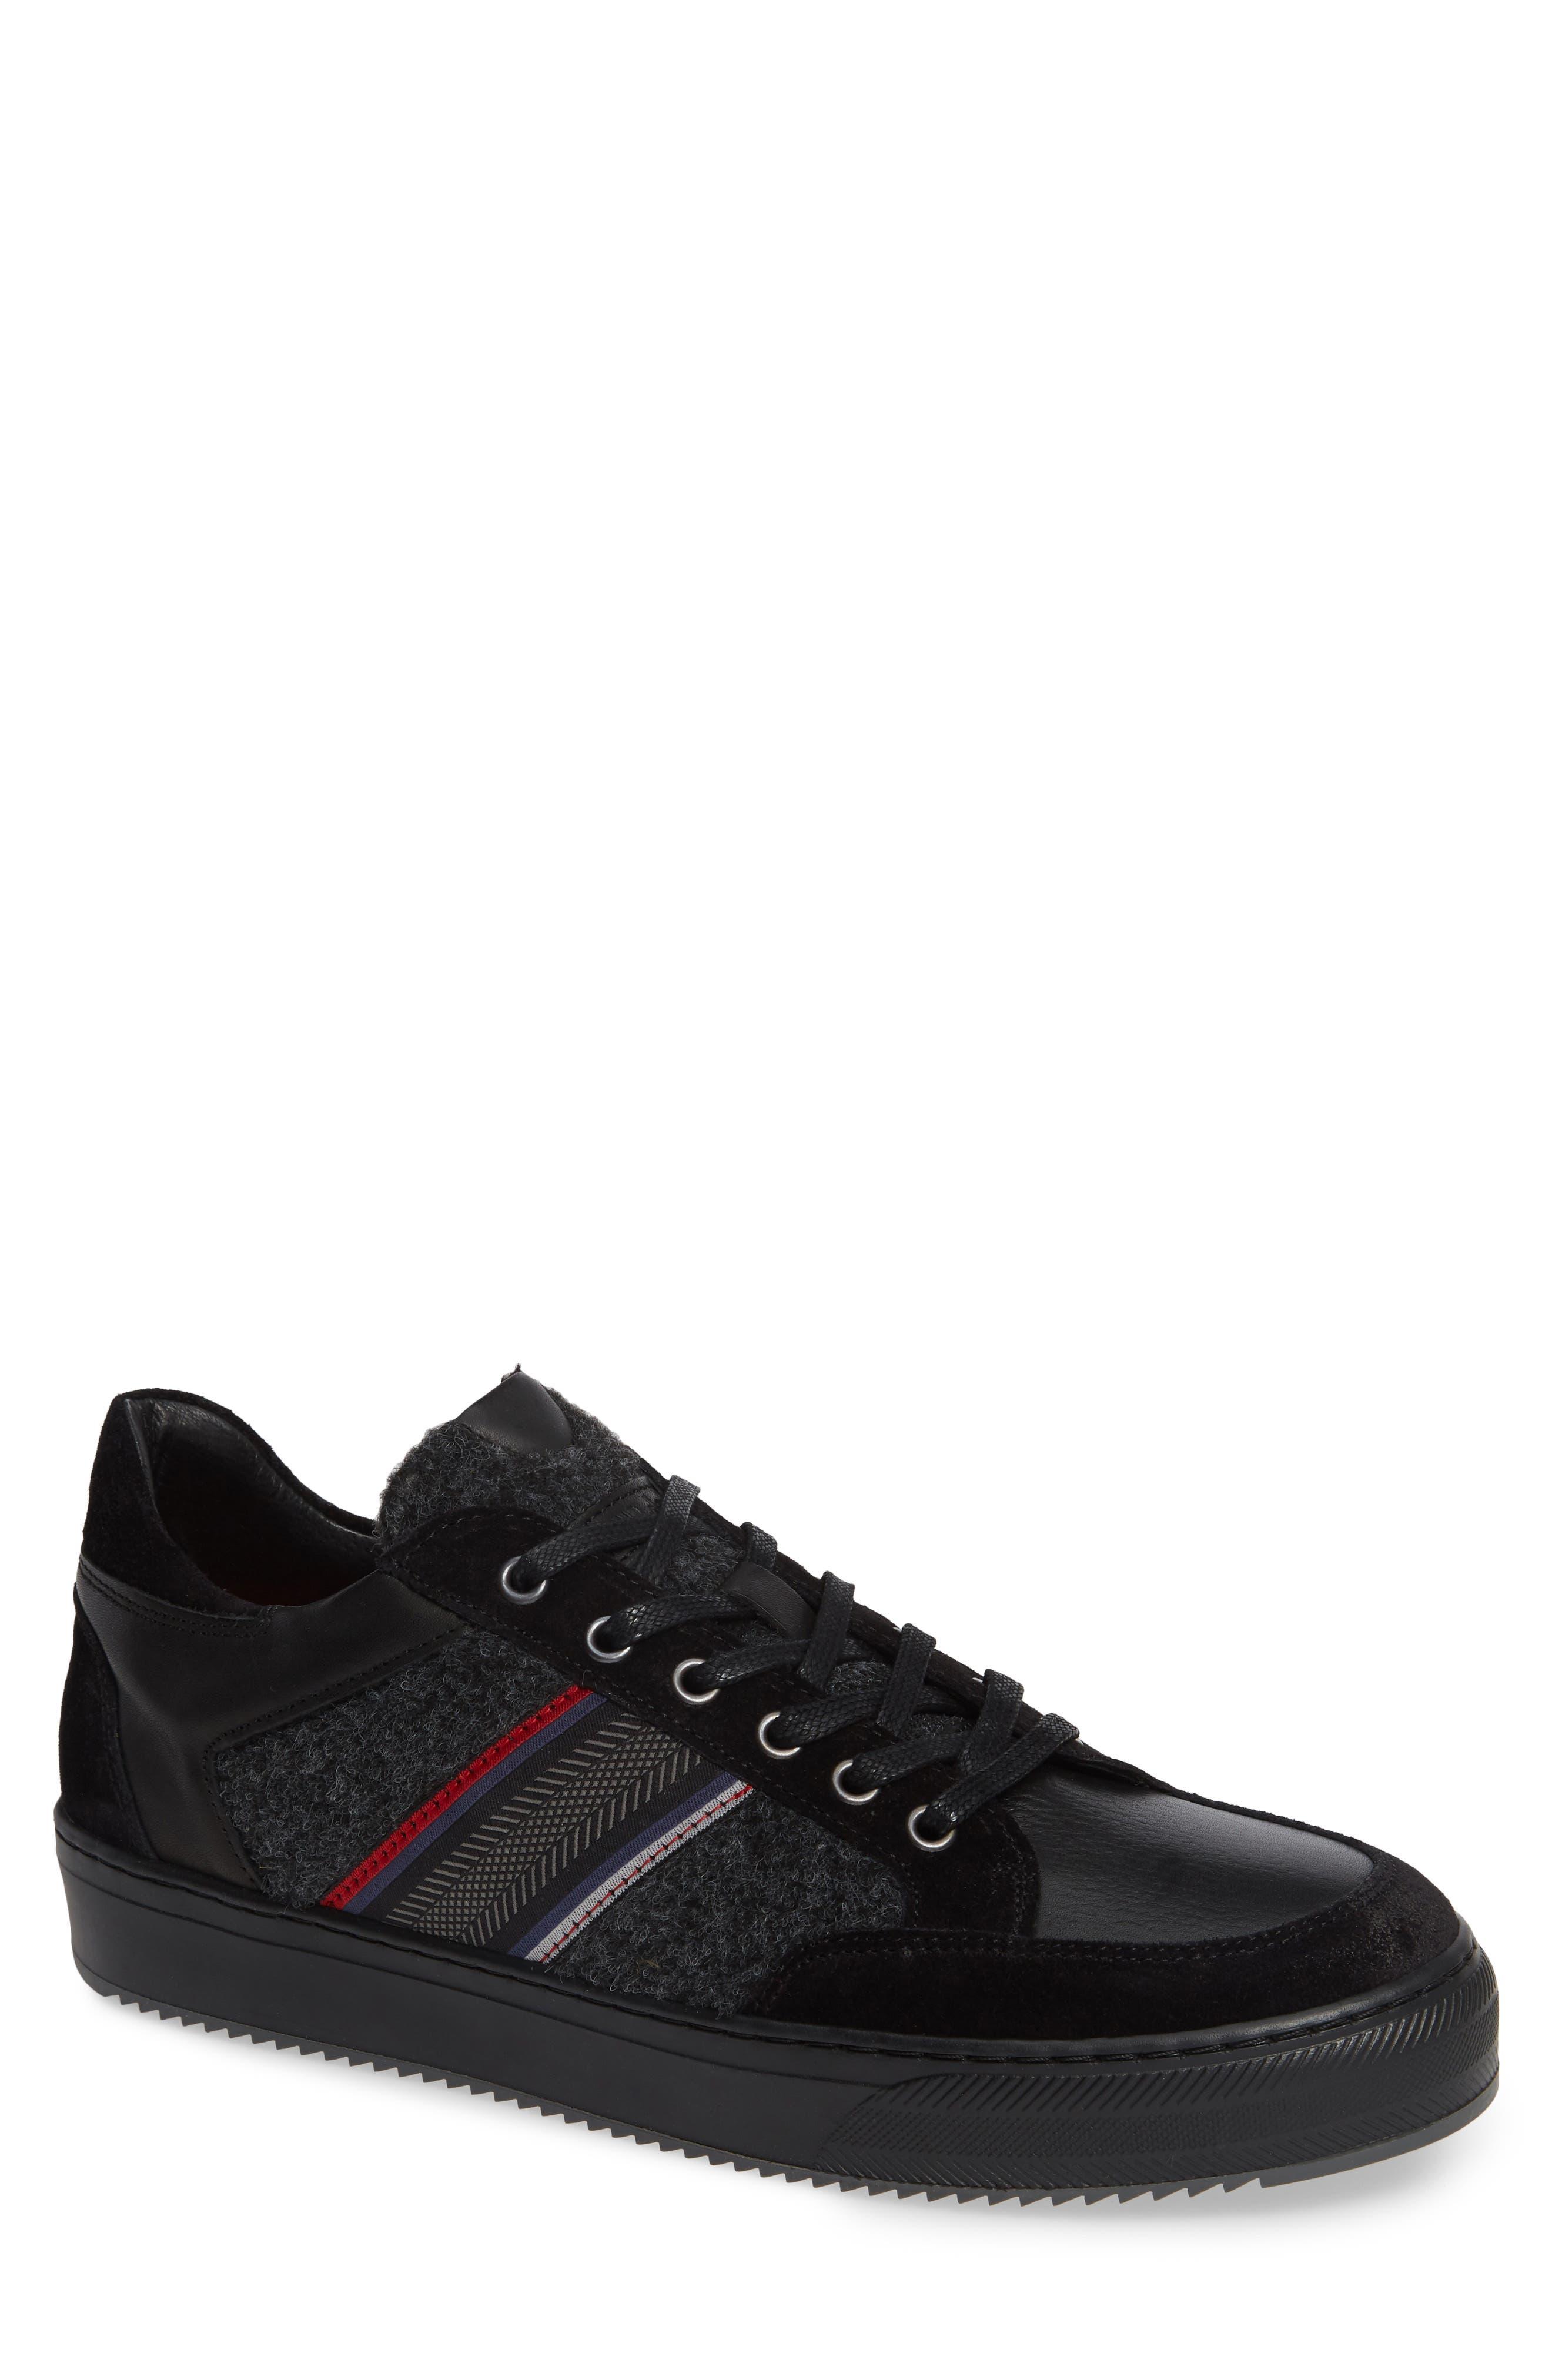 Poggio Sneaker,                             Main thumbnail 1, color,                             BLACK